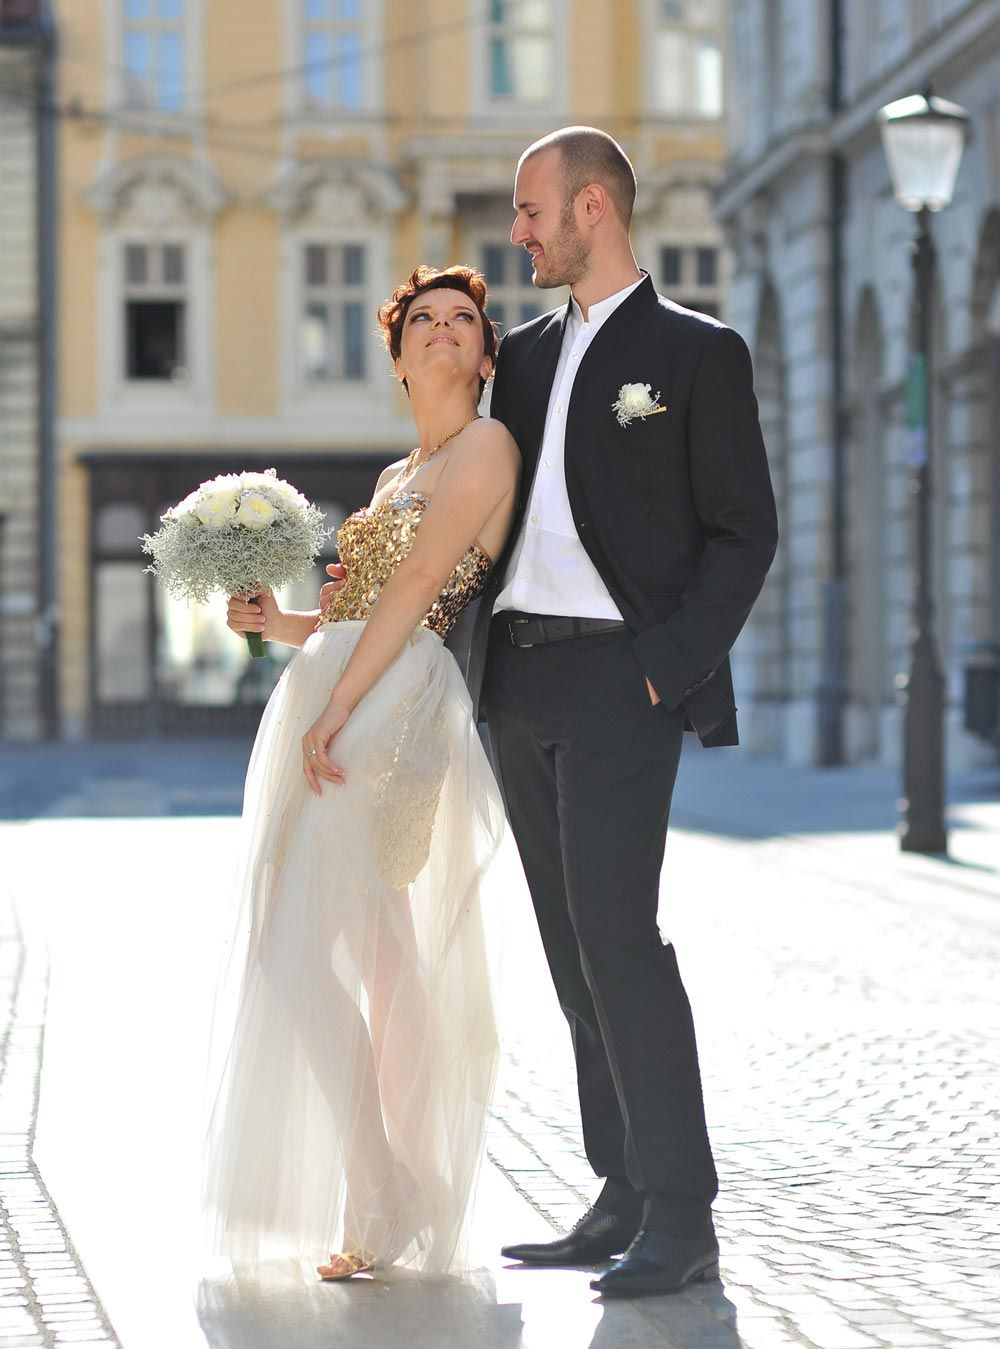 Creative ways to preserve your wedding dress